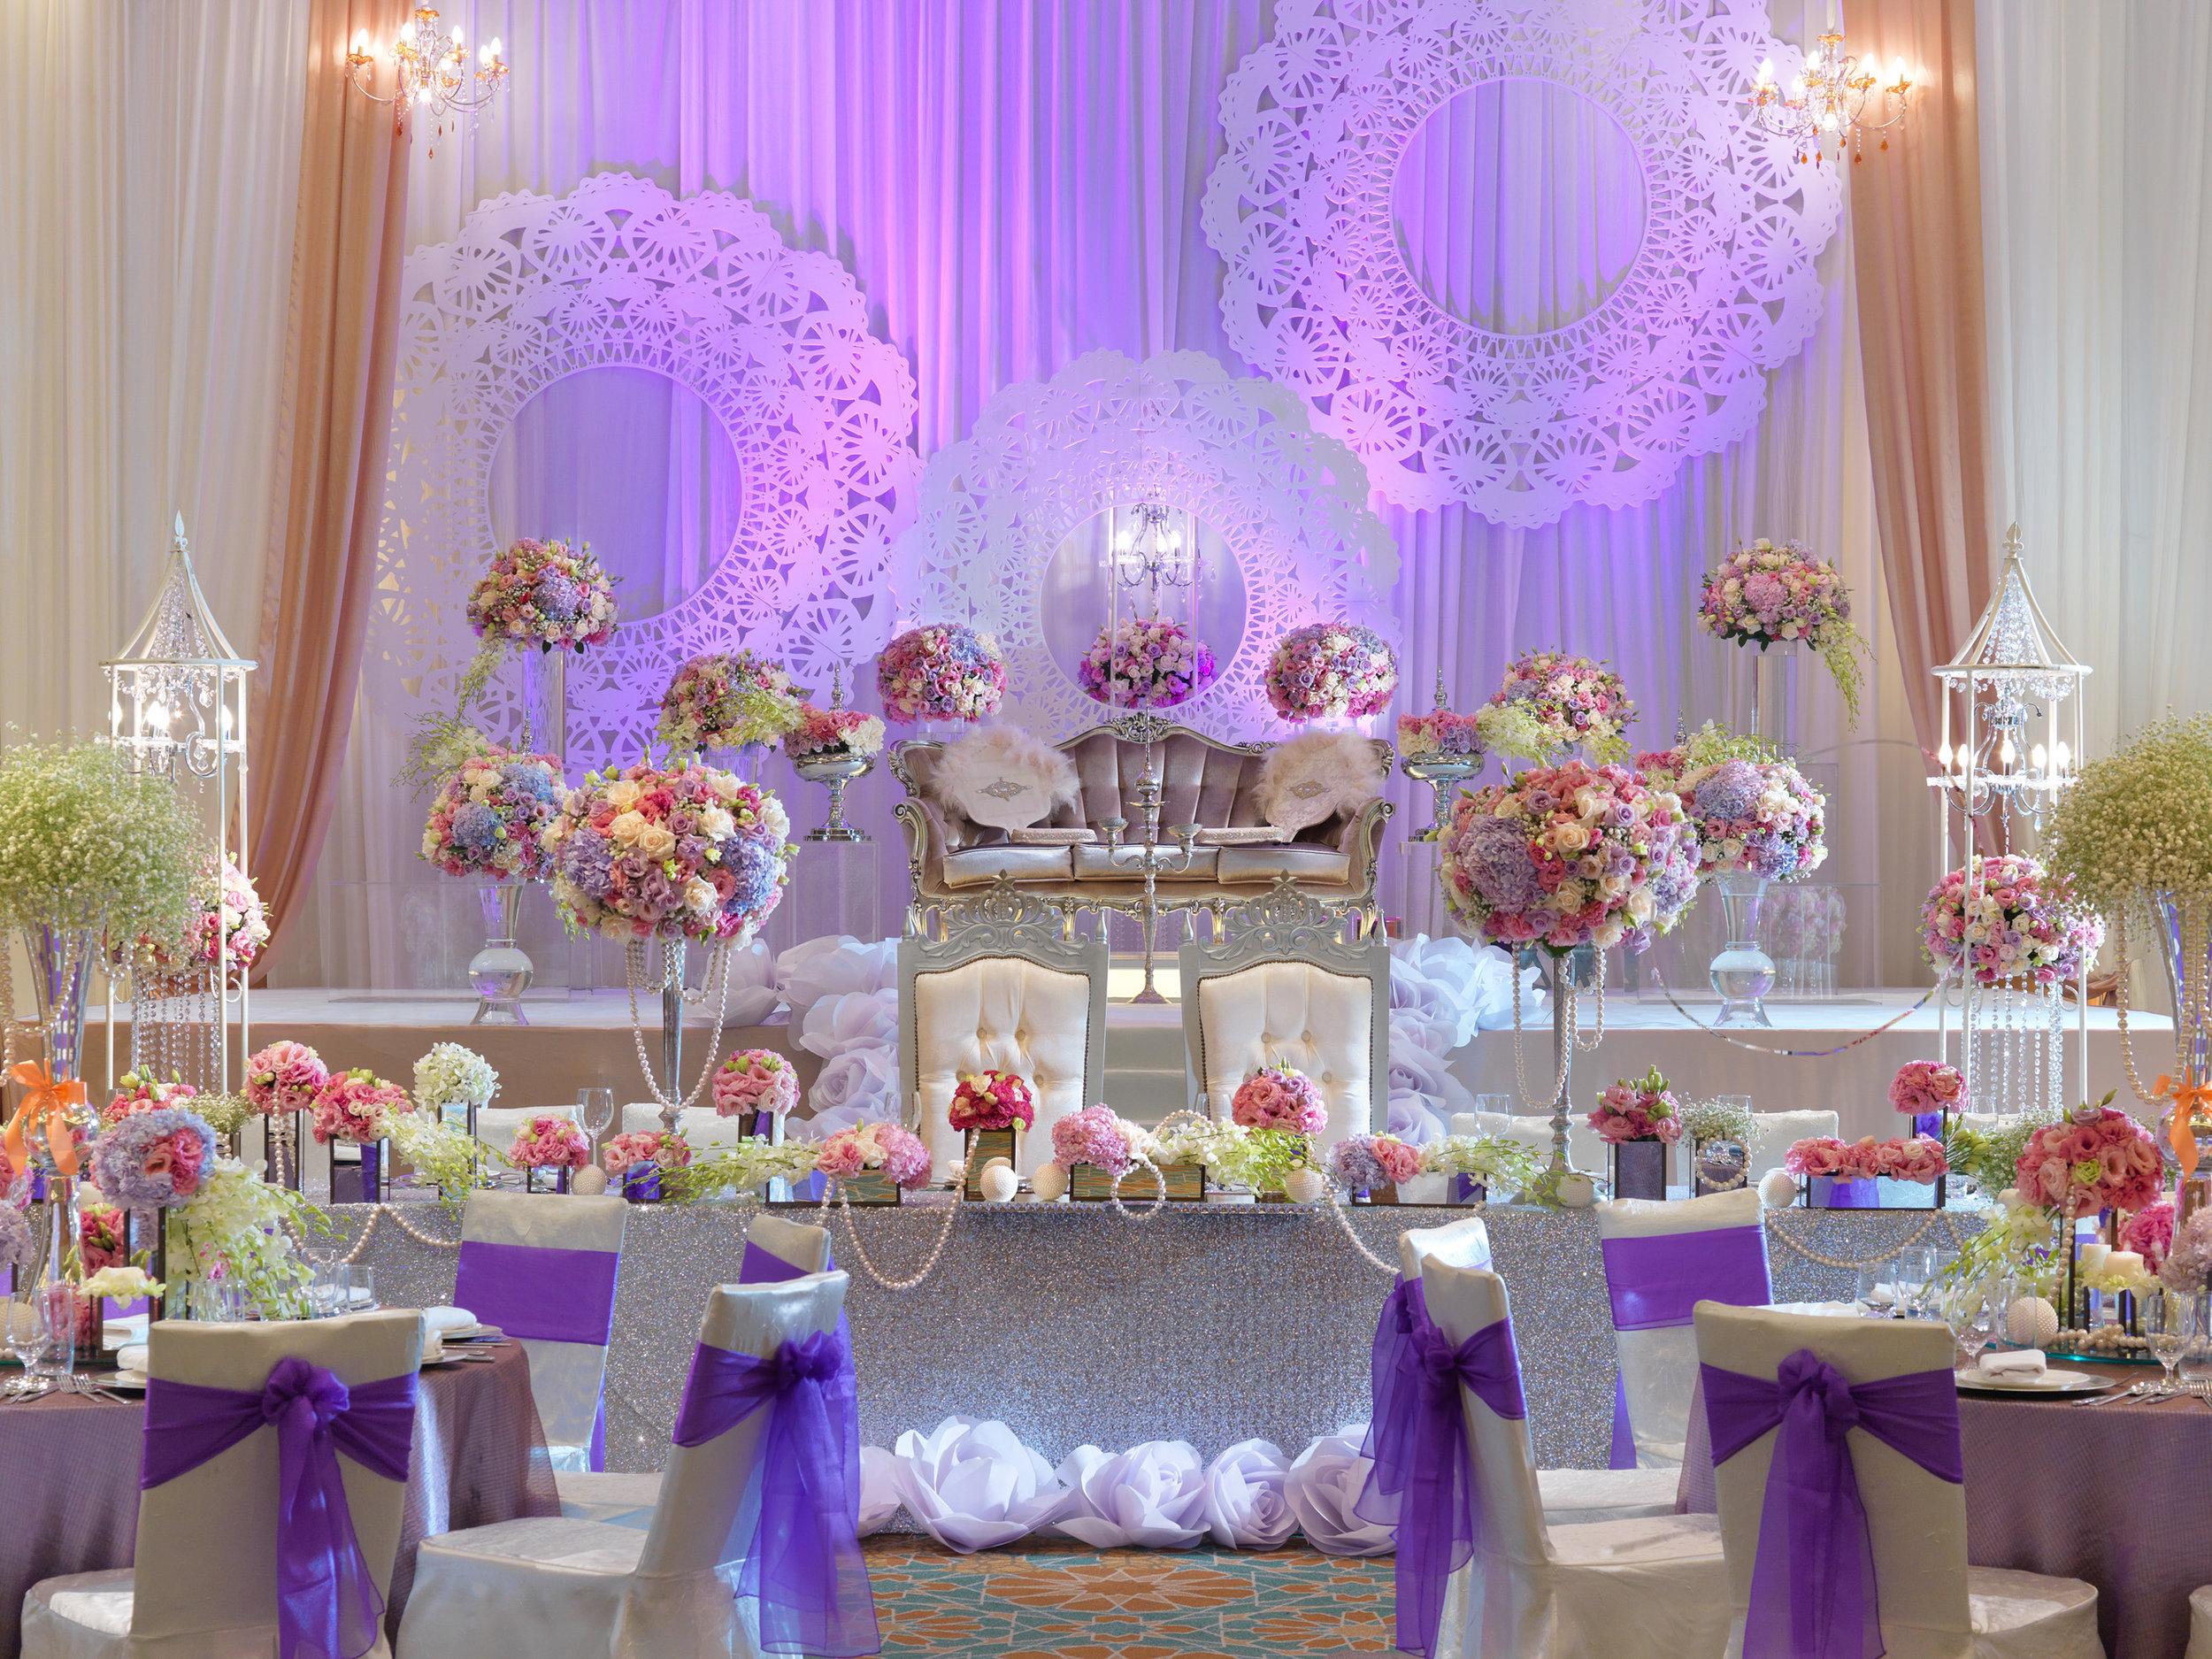 Malay Wedding Set up 5.jpg